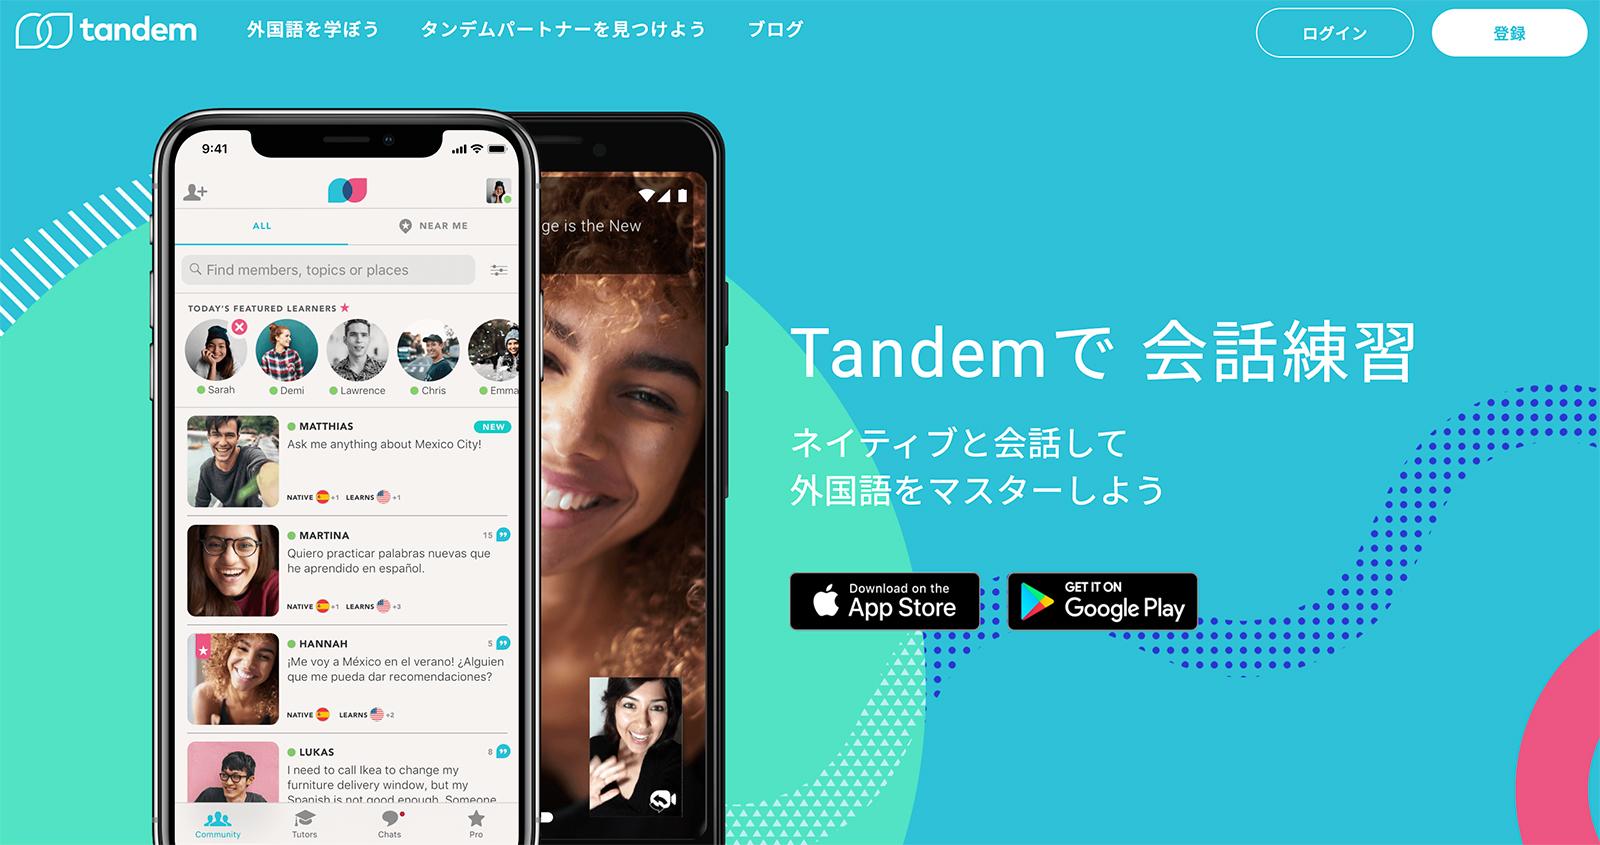 『Temdam』のTOPページ